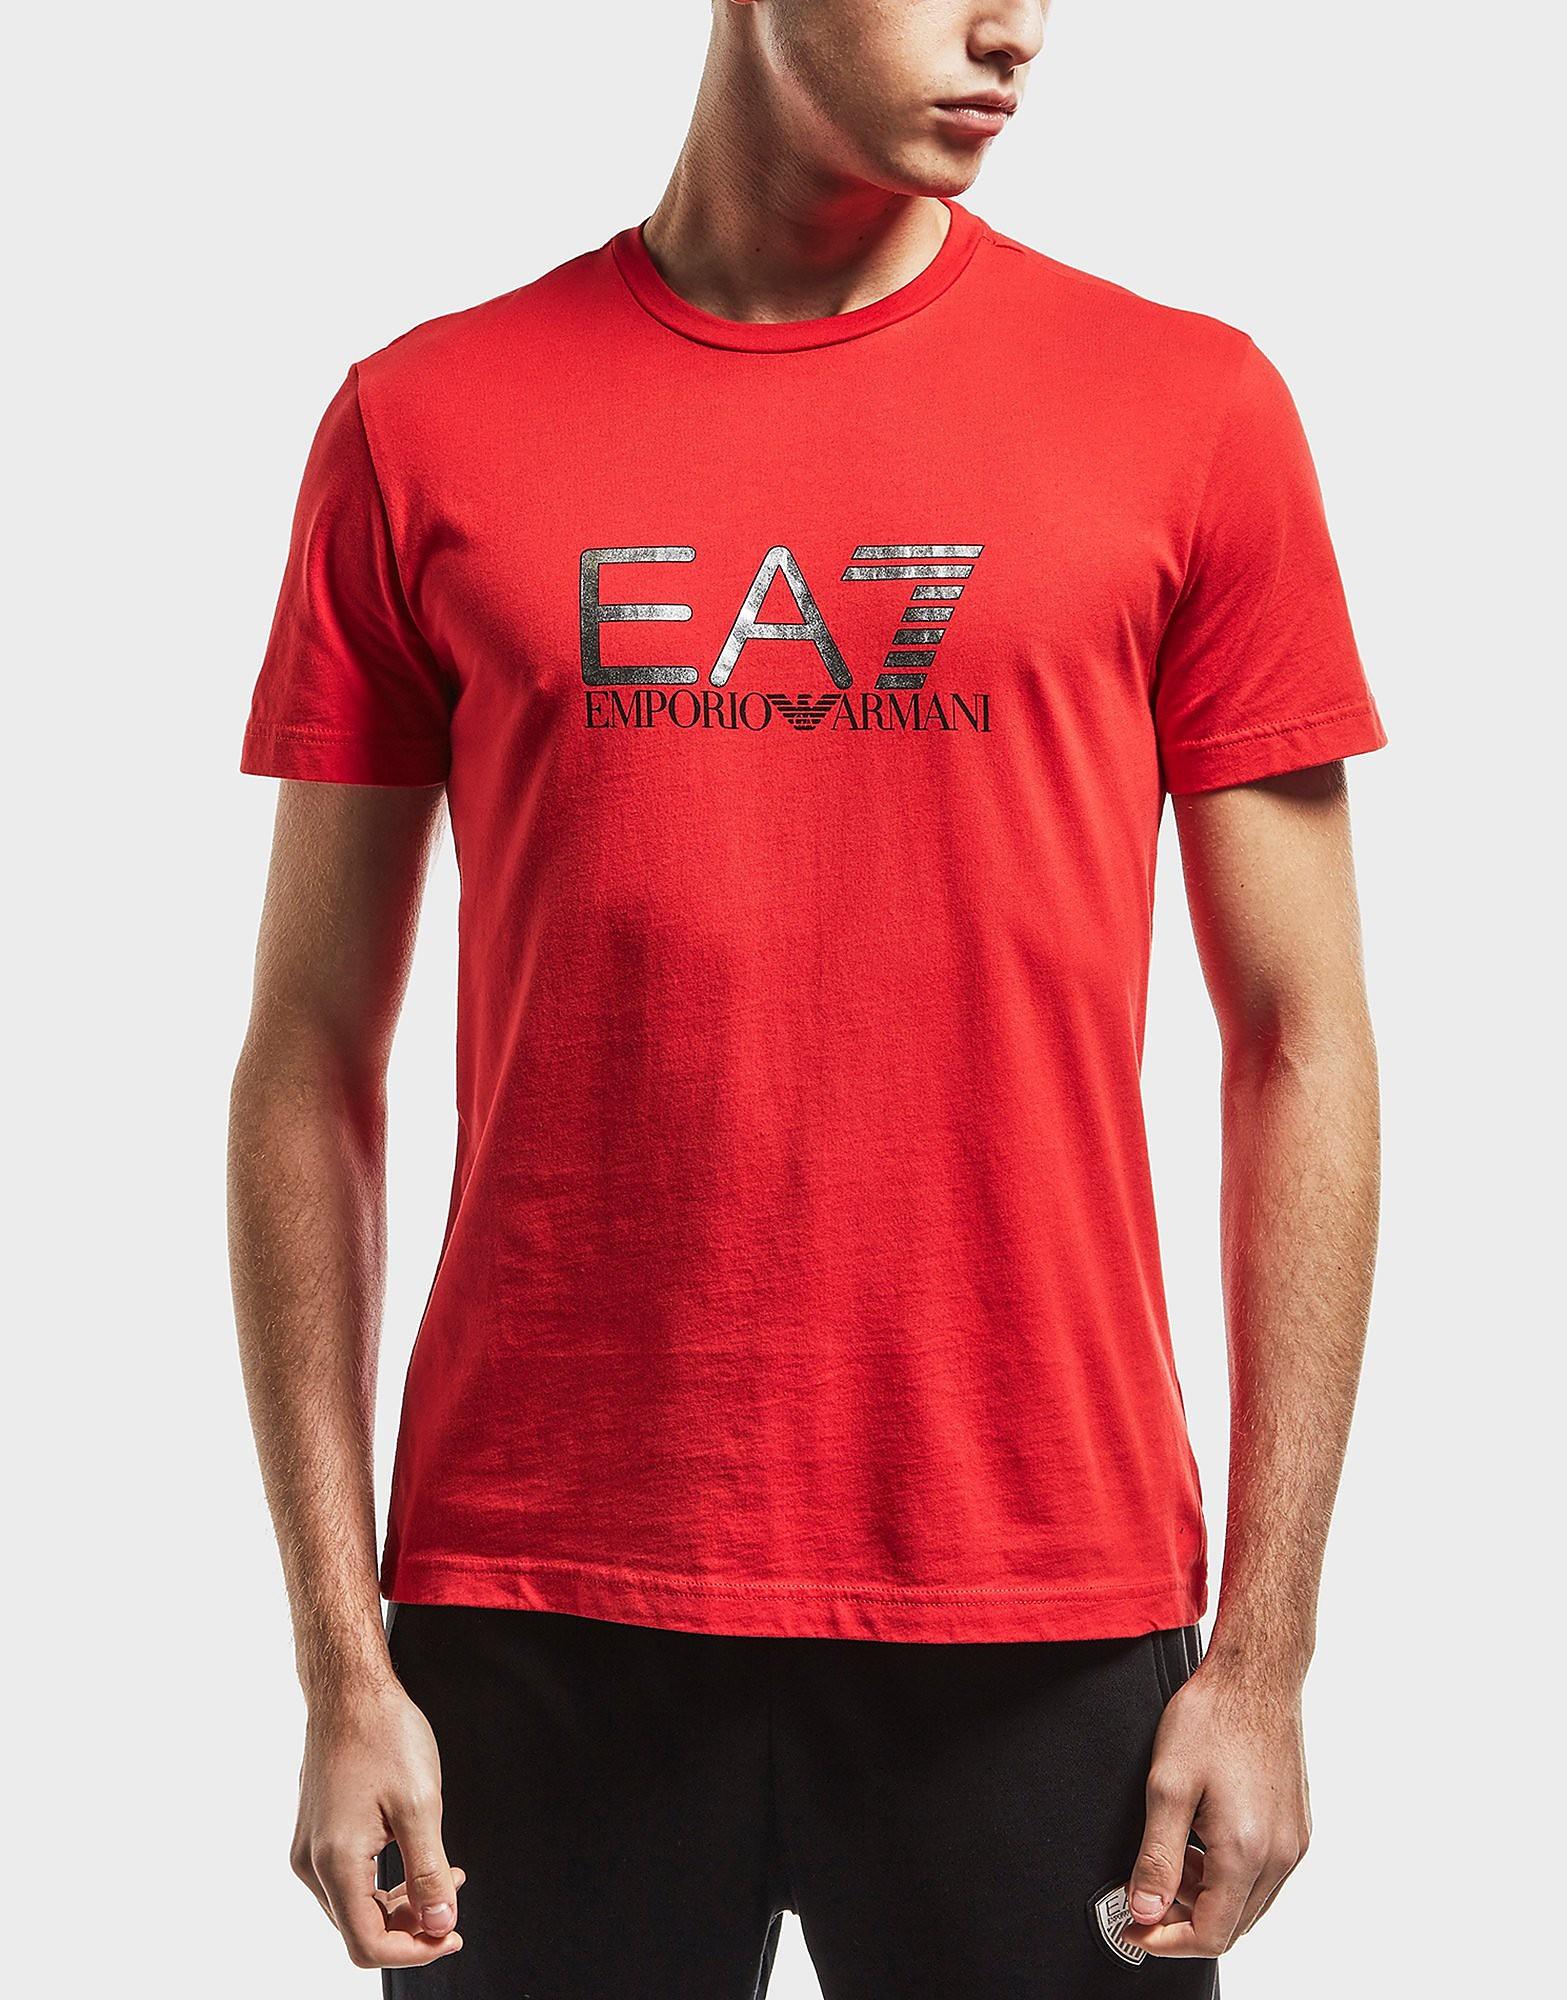 Emporio Armani EA7 Vis Logo Short Sleeve T-Shirt